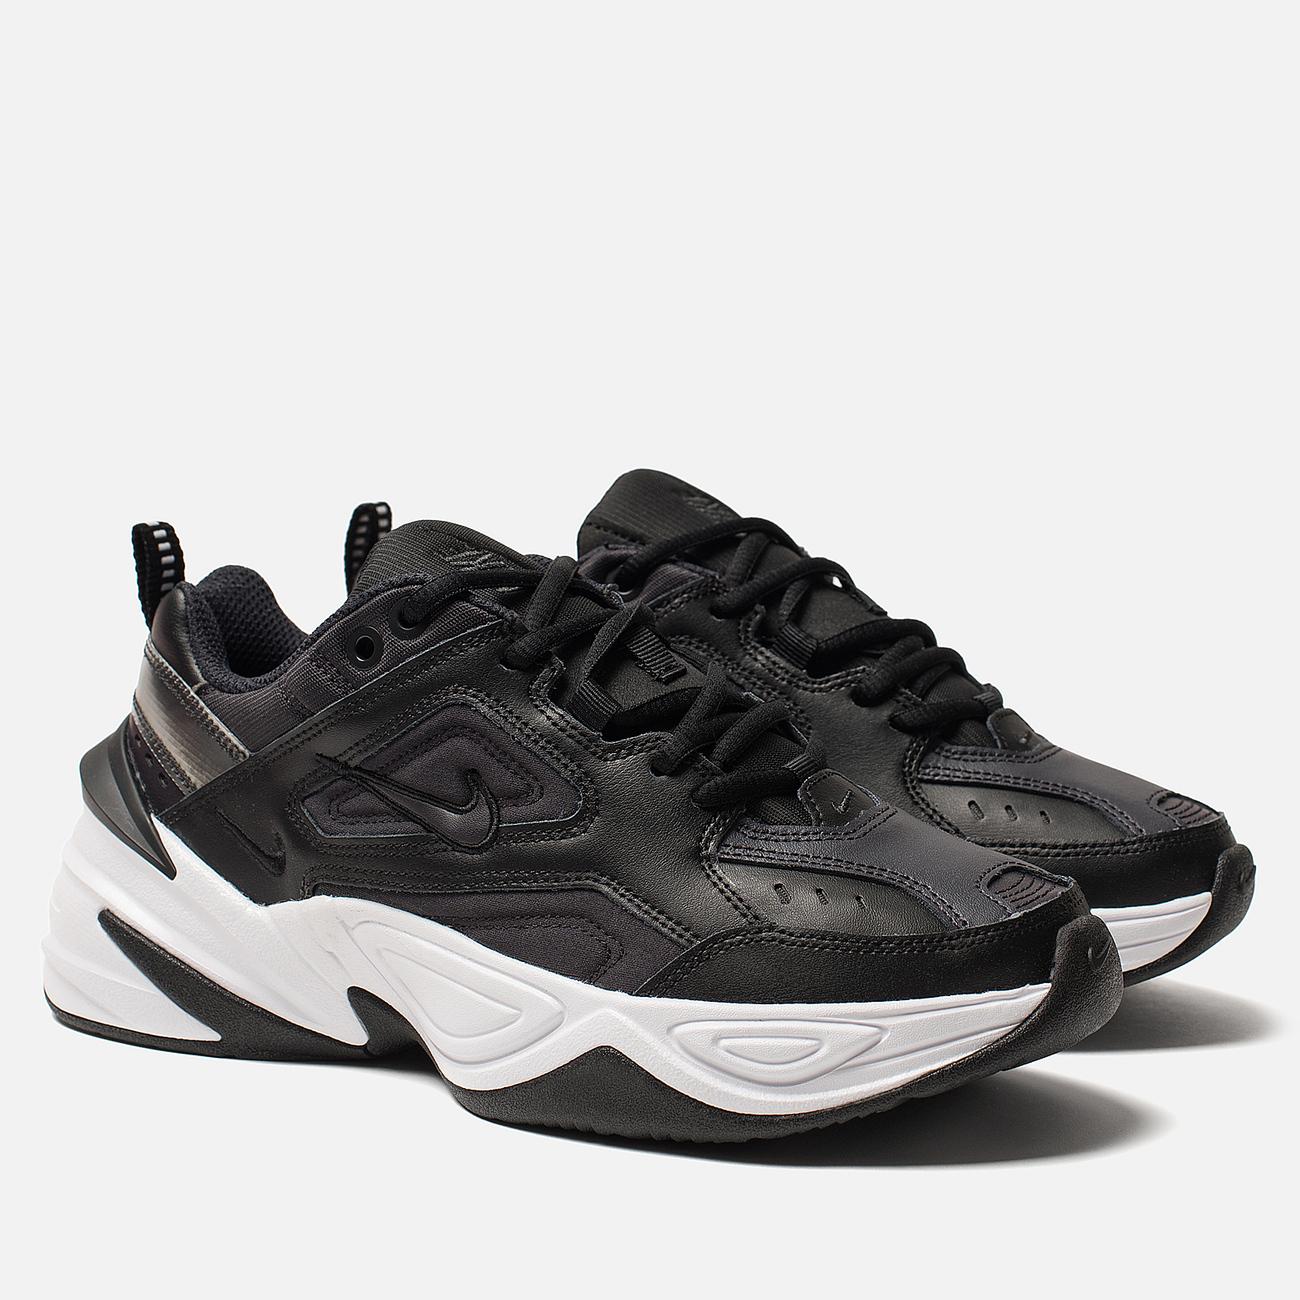 Женские кроссовки Nike M2K Tekno Black/Oil Grey/White